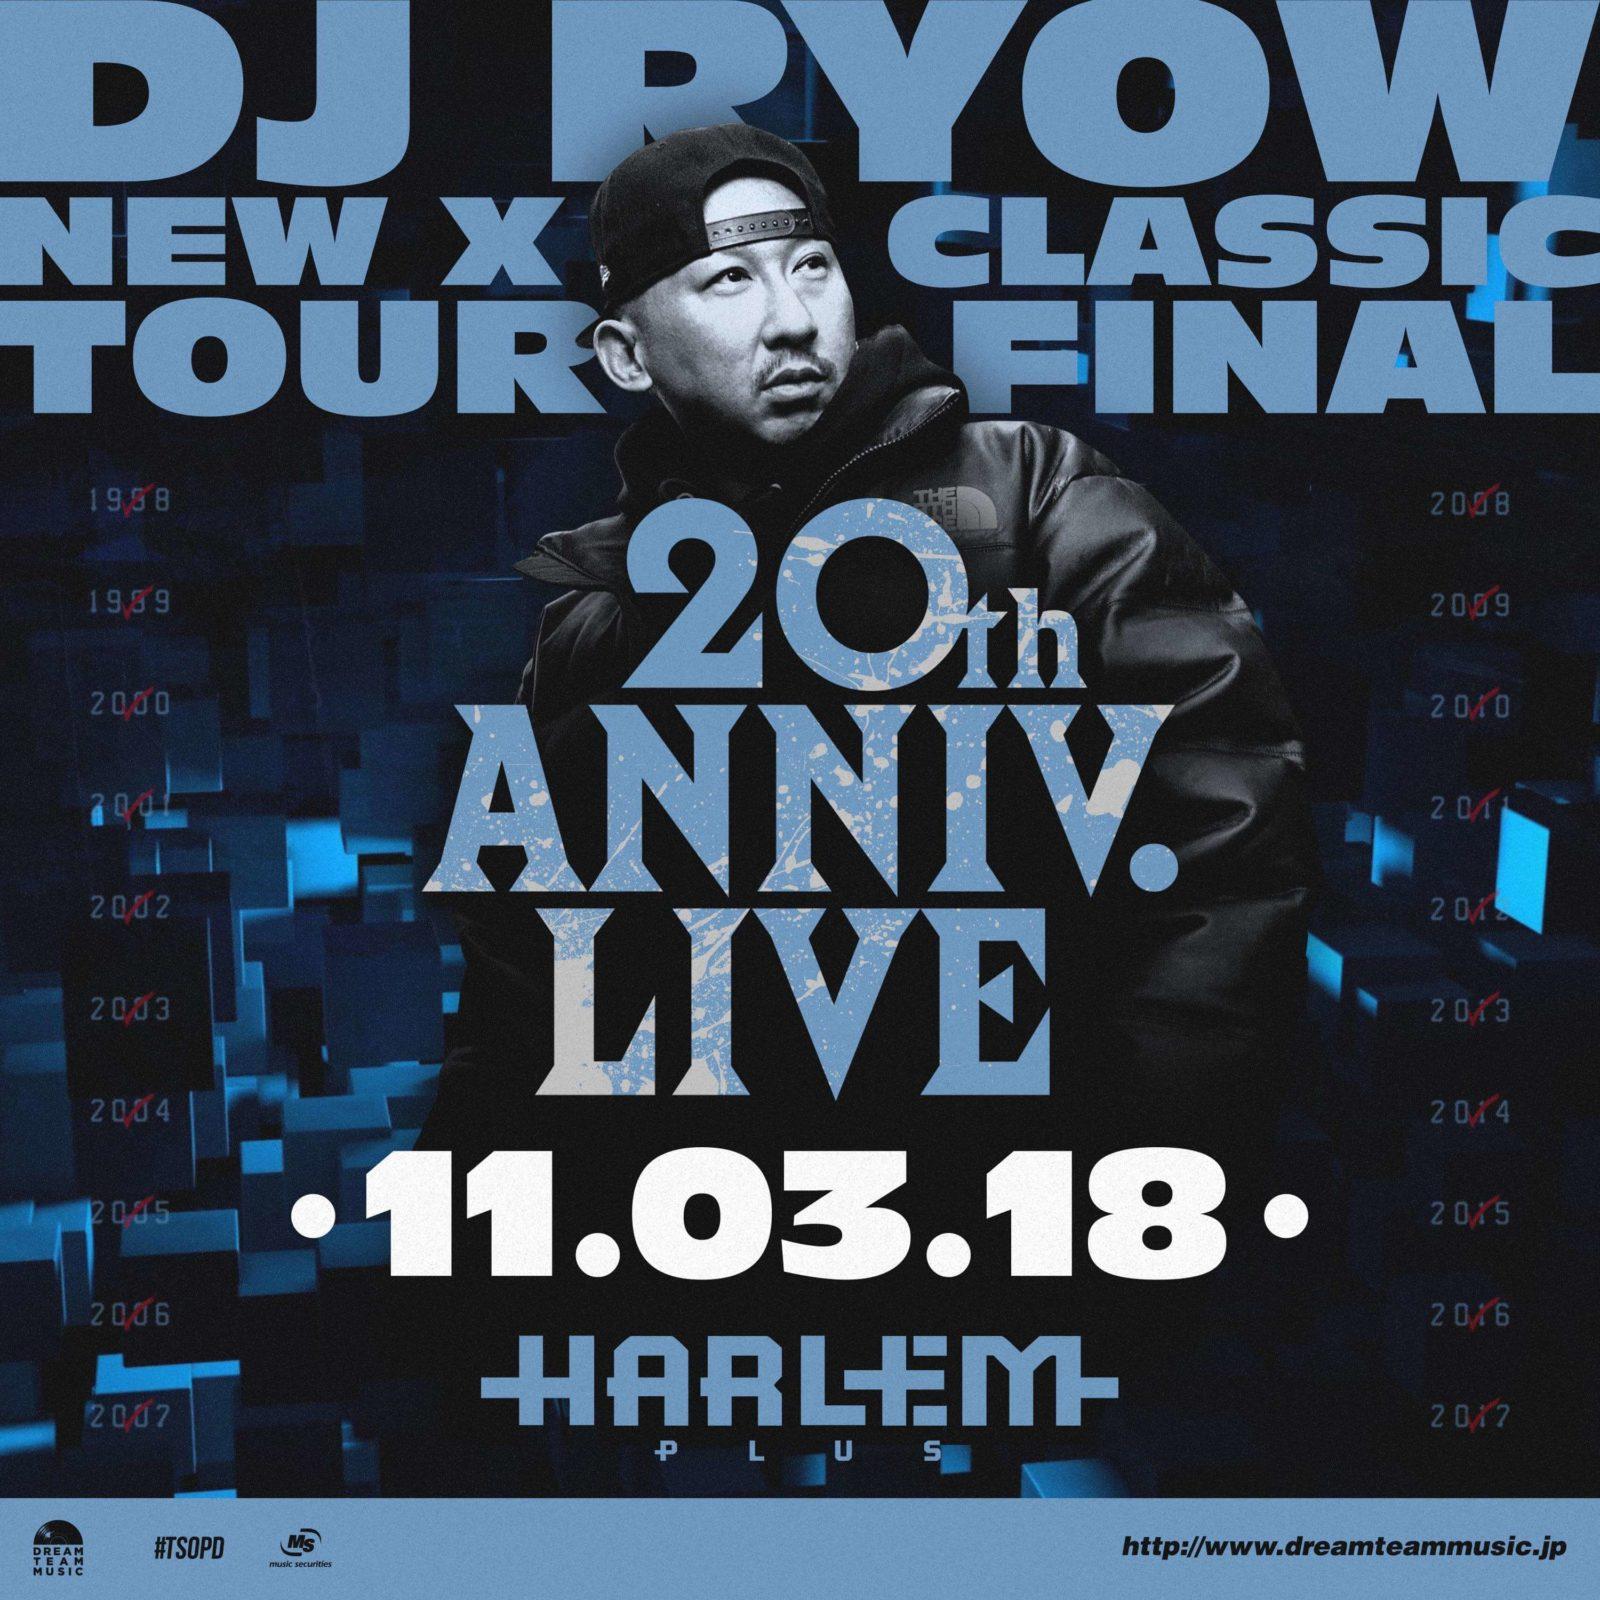 DJ RYOW HIP HOPの聖地で史上最多規模の動員を記録したあの一夜が再び!ツアーファイナル開催サムネイル画像